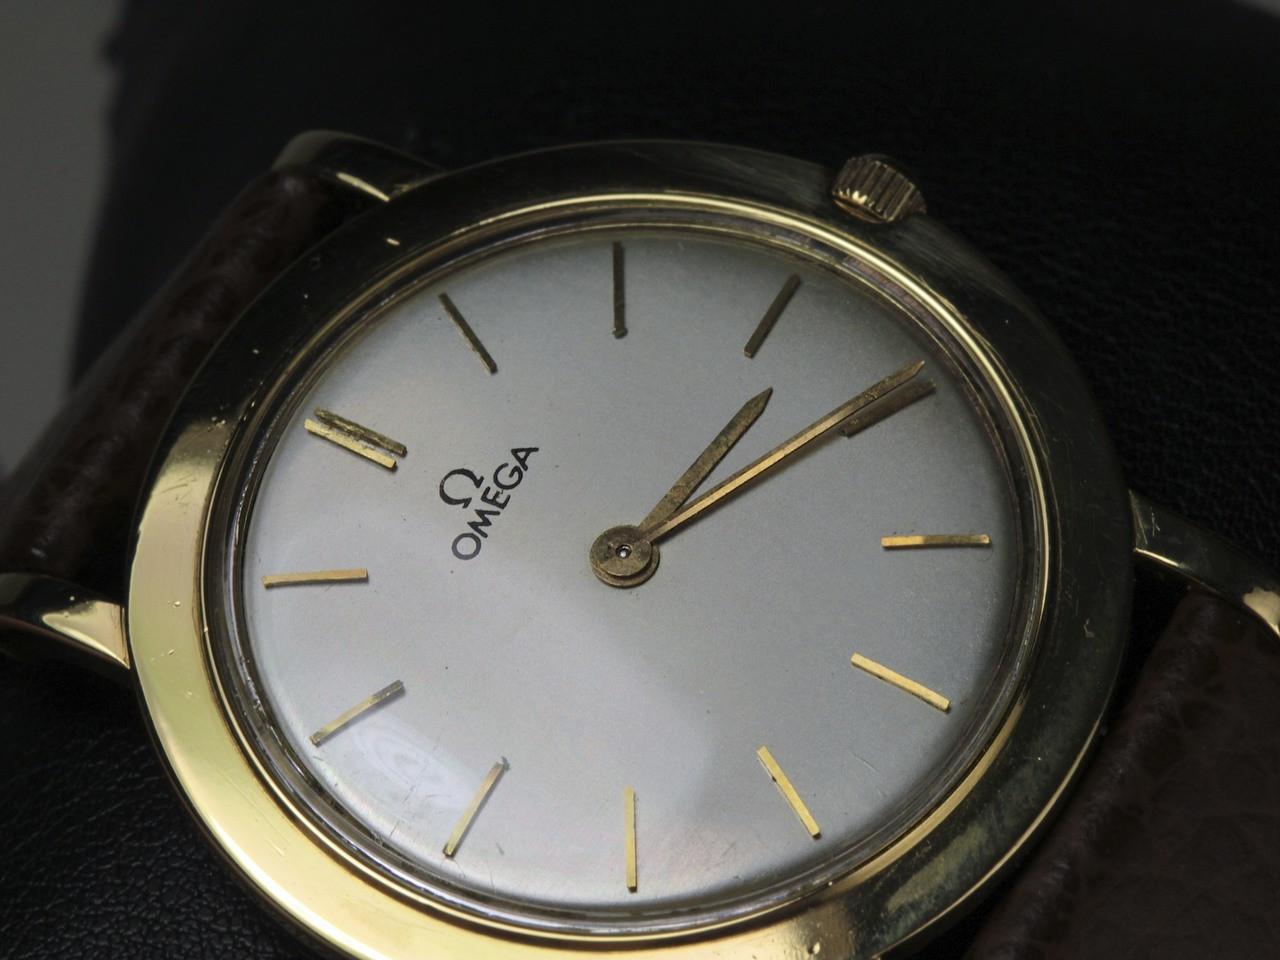 Bezel Polish Detail - Omega Watch - Vintage 18K Yellow Gold 14718 - www.Legendoftime.com - Chicago Watch Center